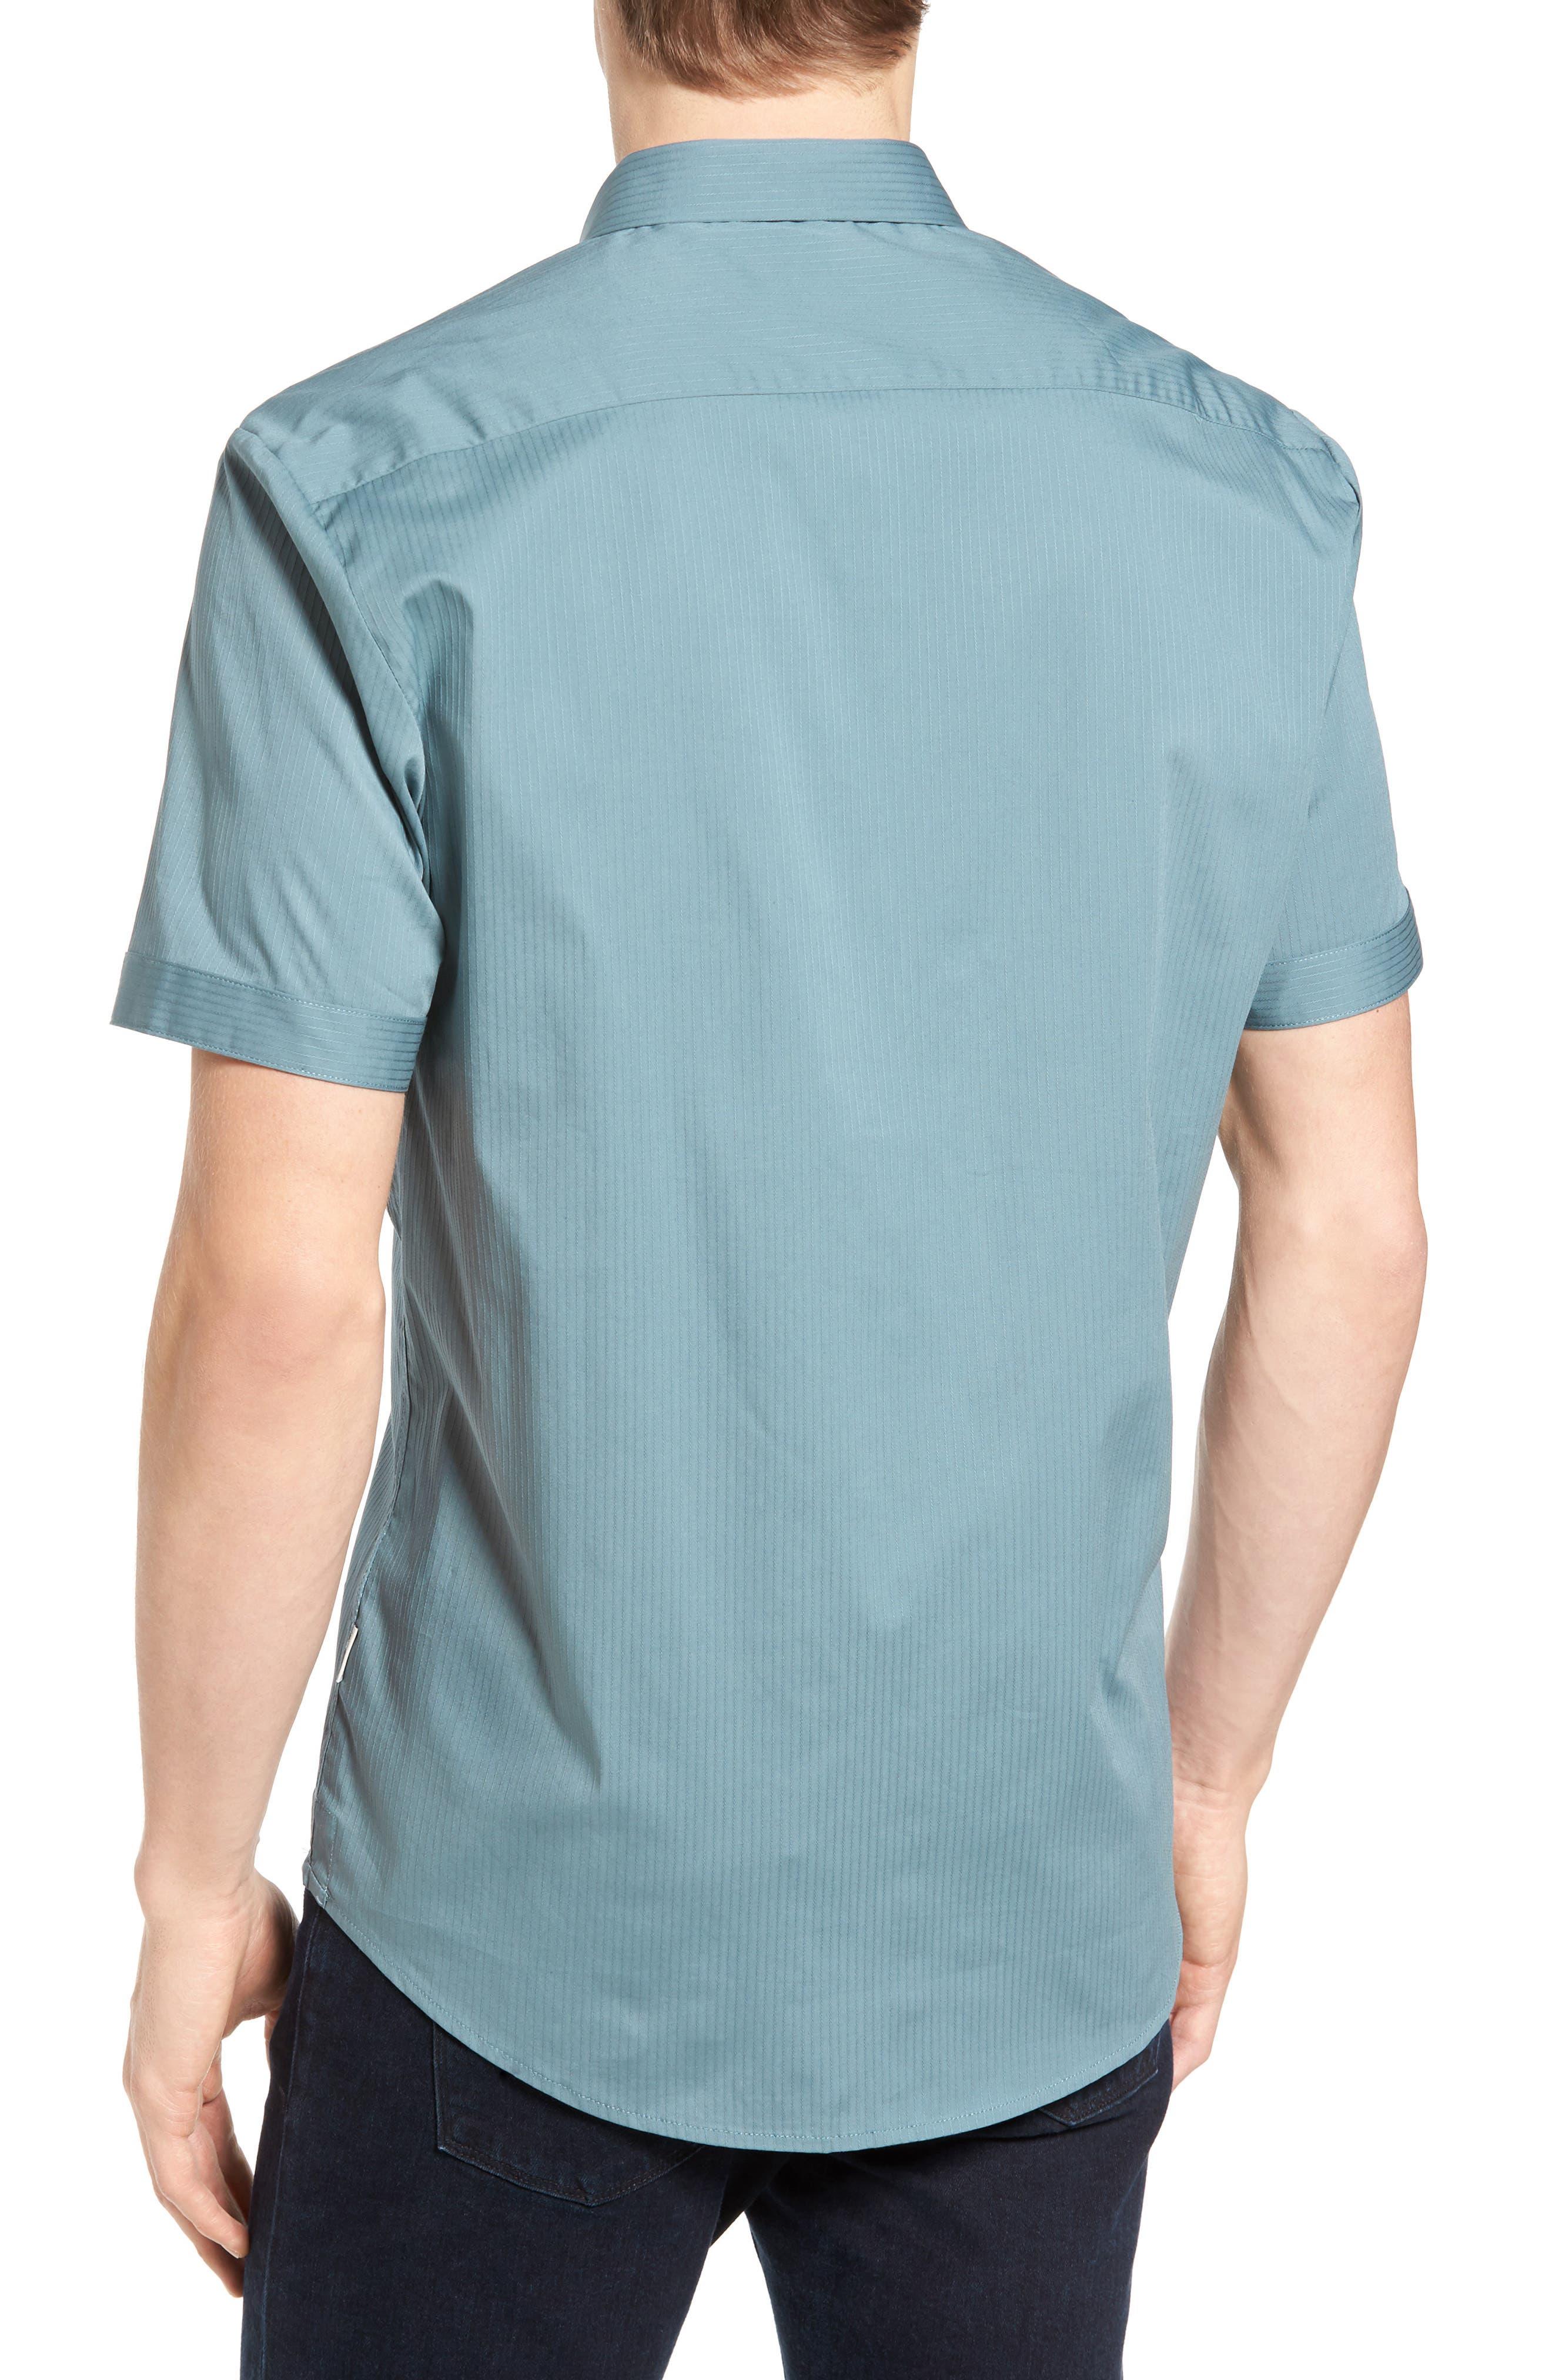 City Savior Woven Shirt,                             Alternate thumbnail 2, color,                             Stormy Sea